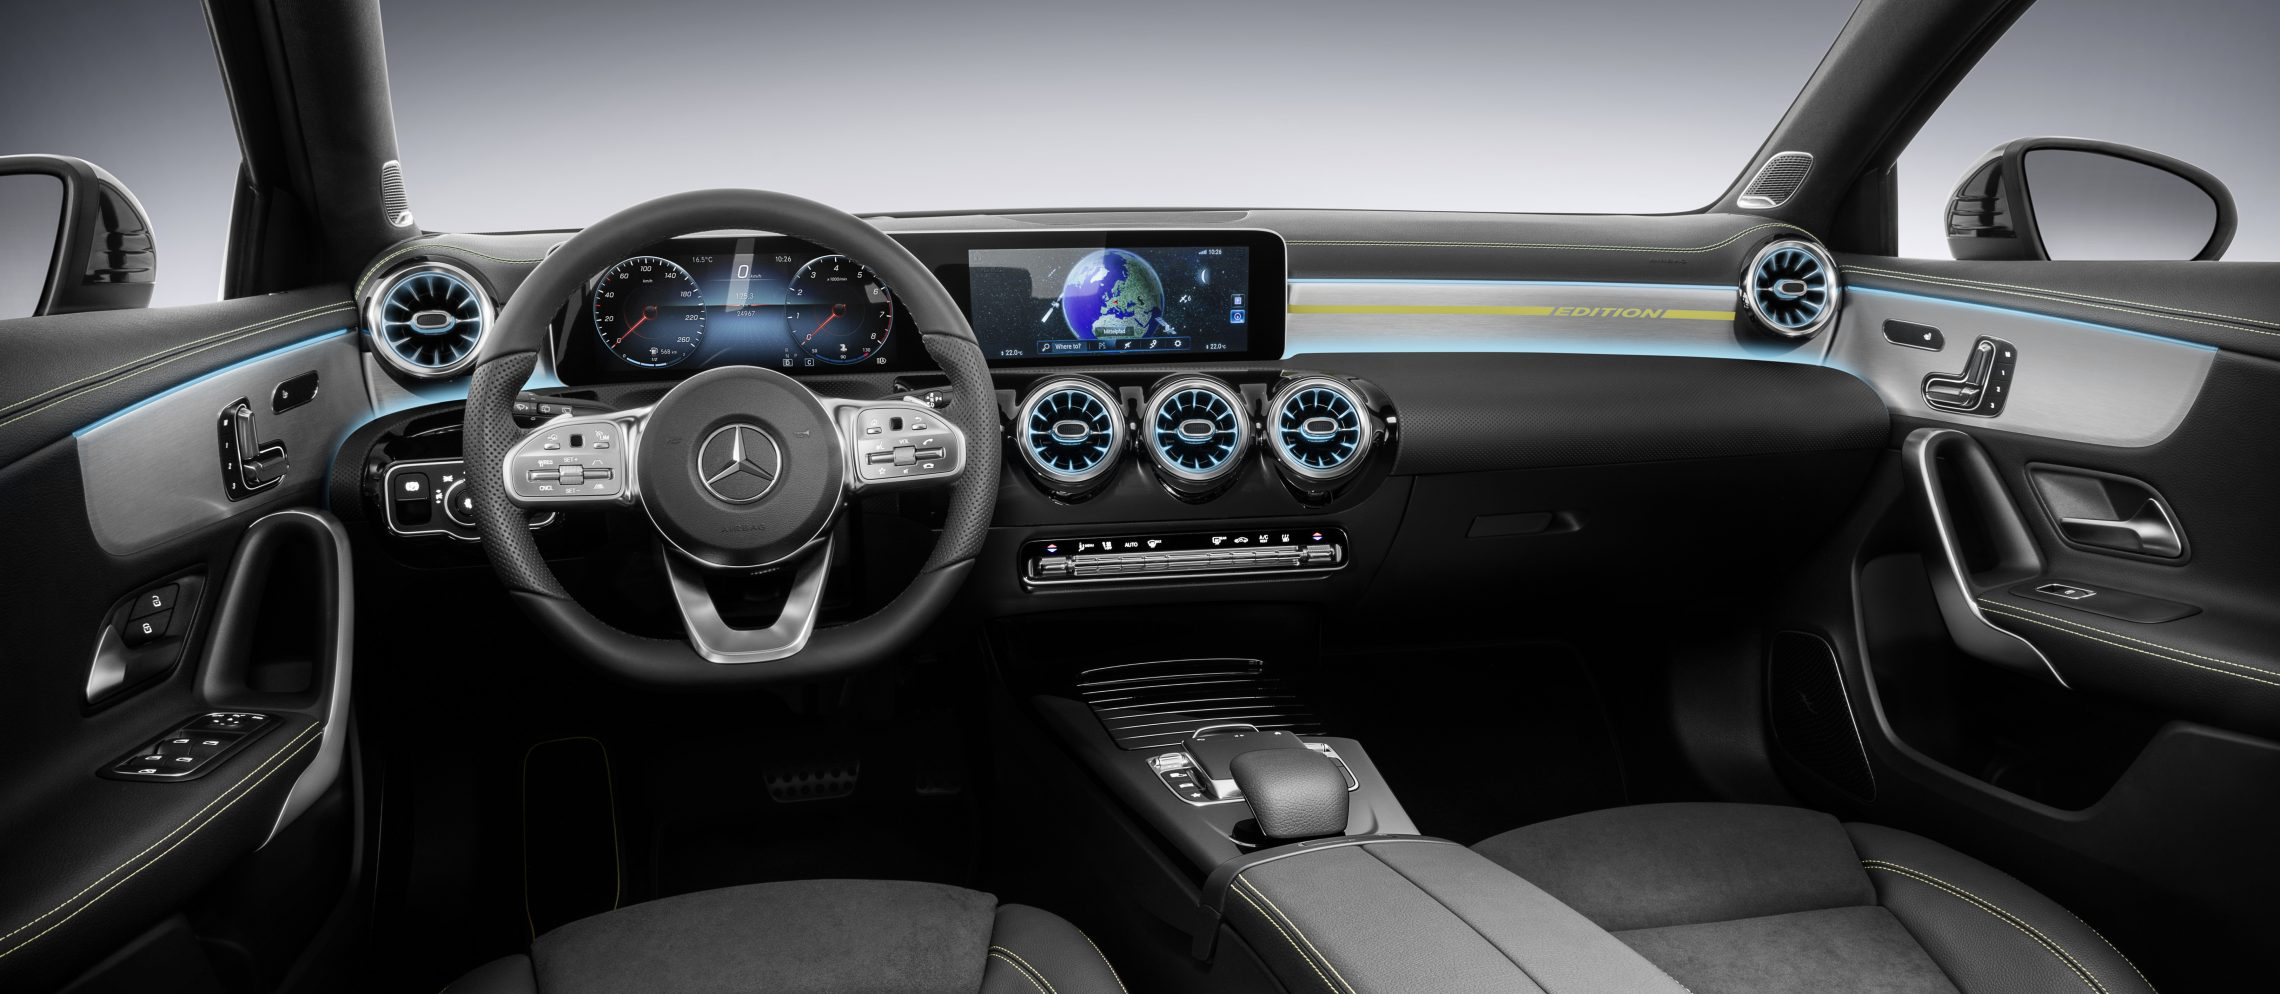 Top Motorist - 2019 Mercedes-Benz A220 - Automotive Review